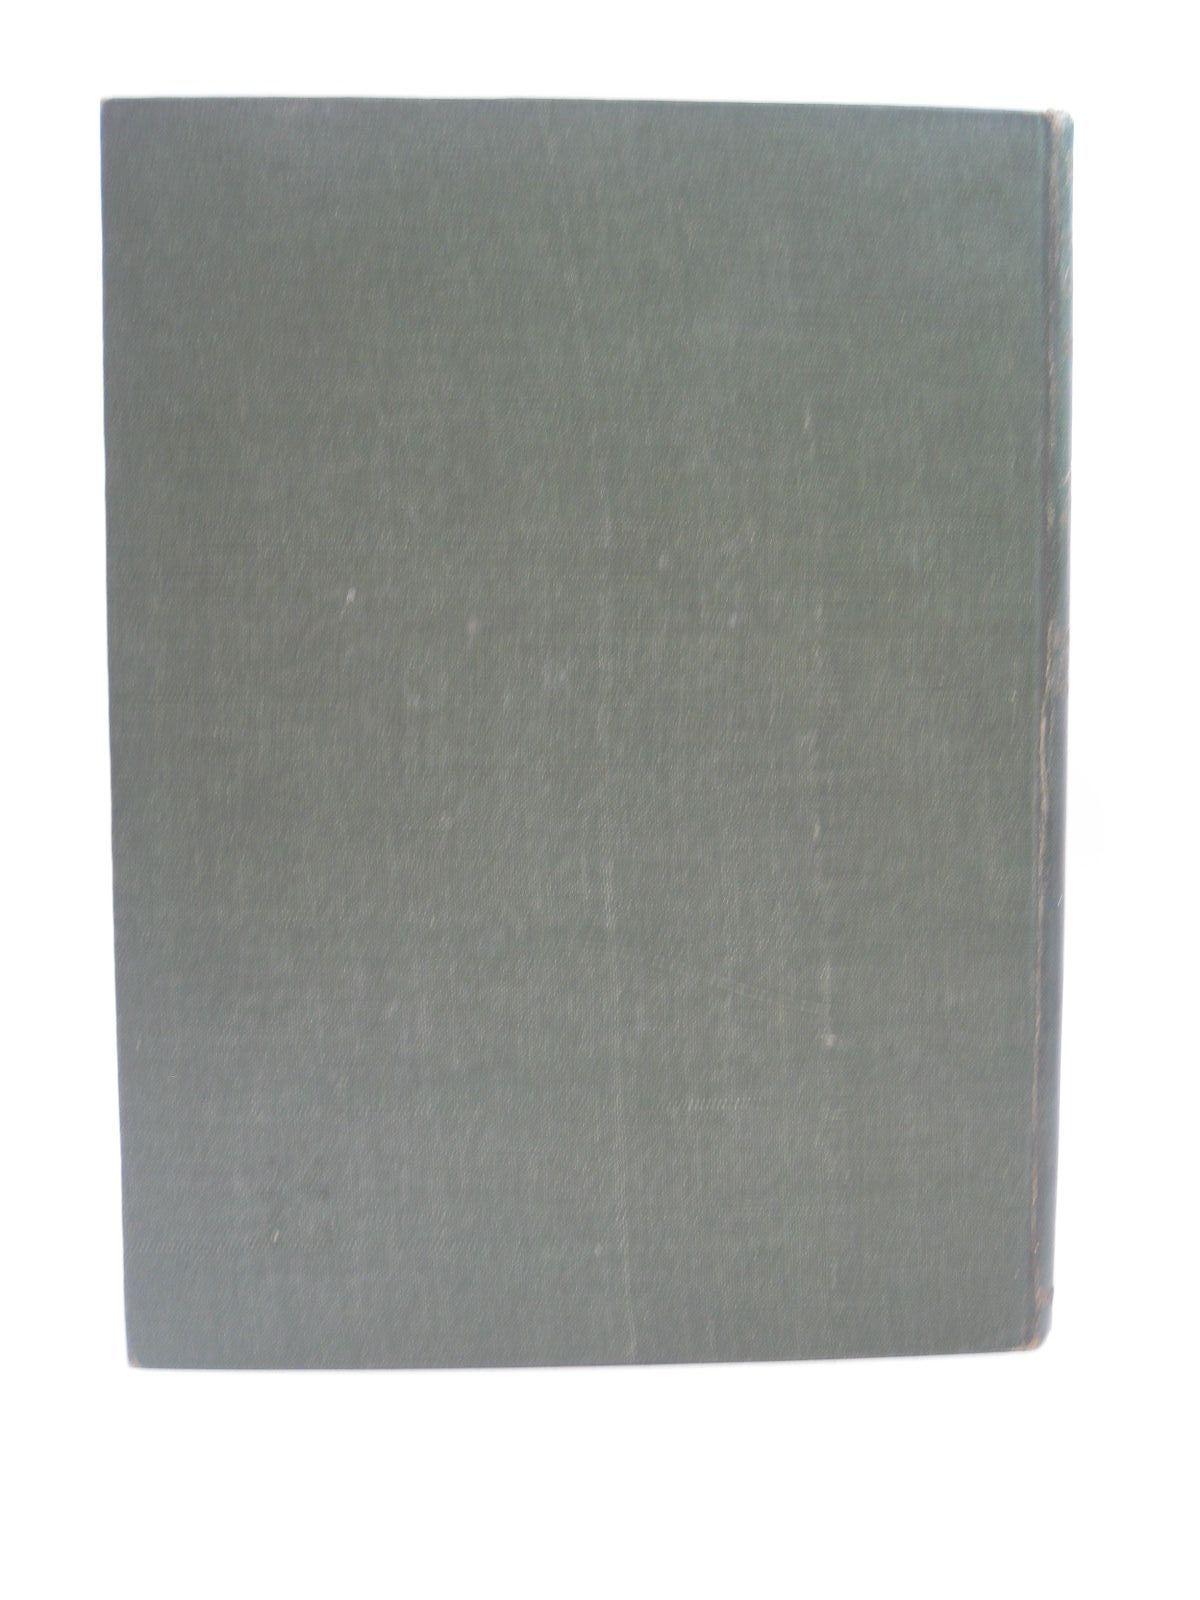 Photo of THE SPRINGTIDE OF LIFE written by Swinburne, Algernon C. Gosse, Edmund illustrated by Rackham, Arthur published by William Heinemann (STOCK CODE: 1404092)  for sale by Stella & Rose's Books